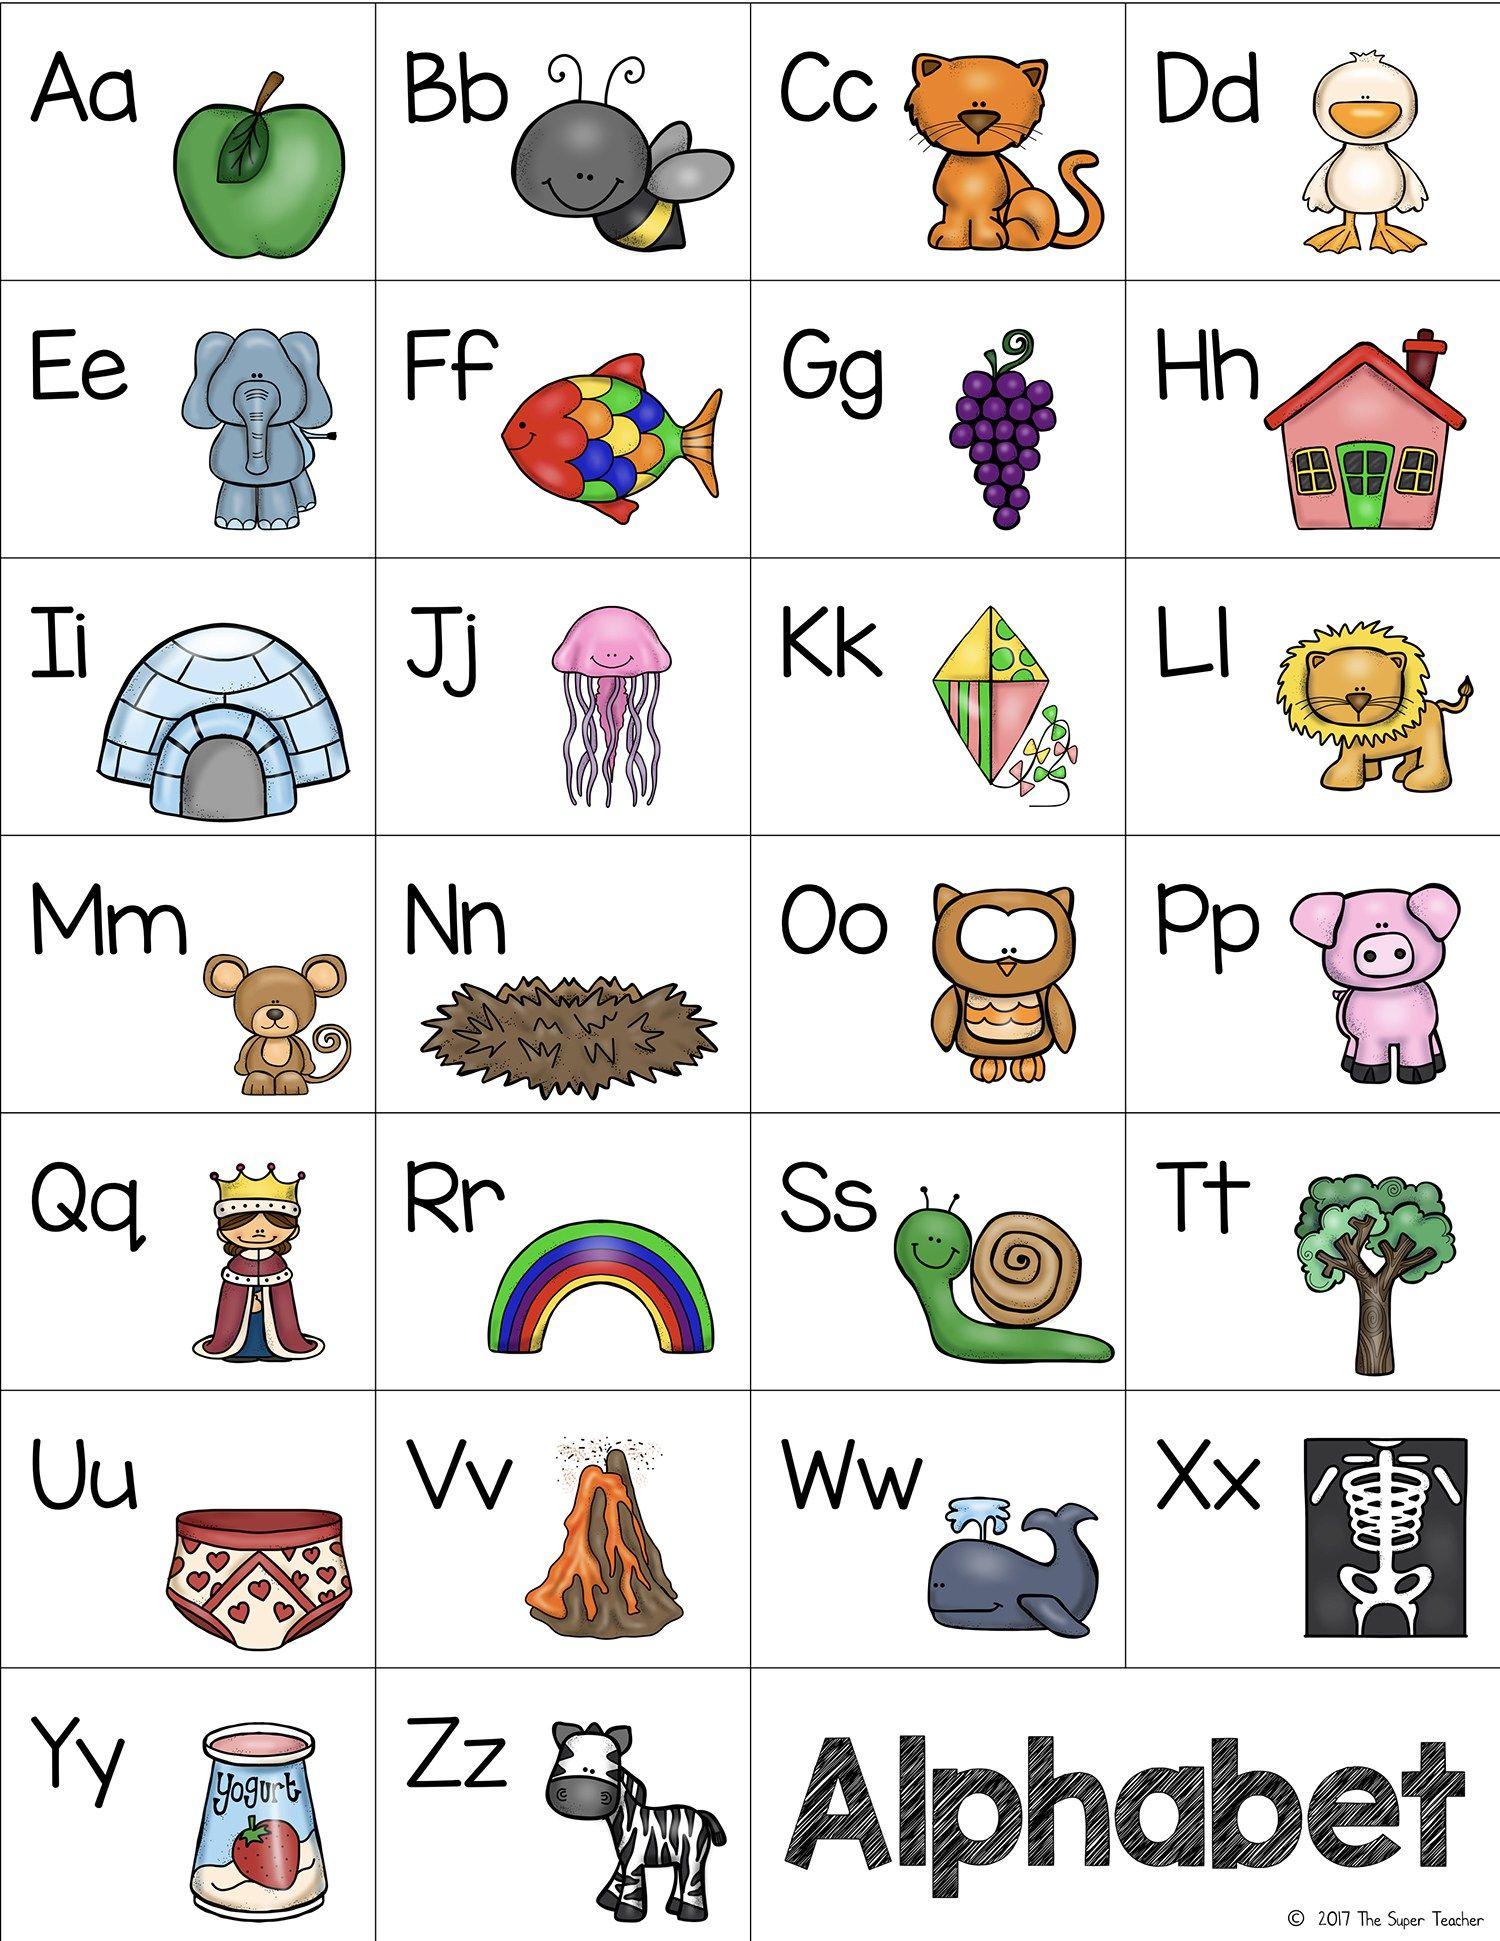 Free Preschool Worksheet You Will Use All The Time Free Preschool Worksheets Preschool Worksheets Free Preschool [ 1941 x 1500 Pixel ]